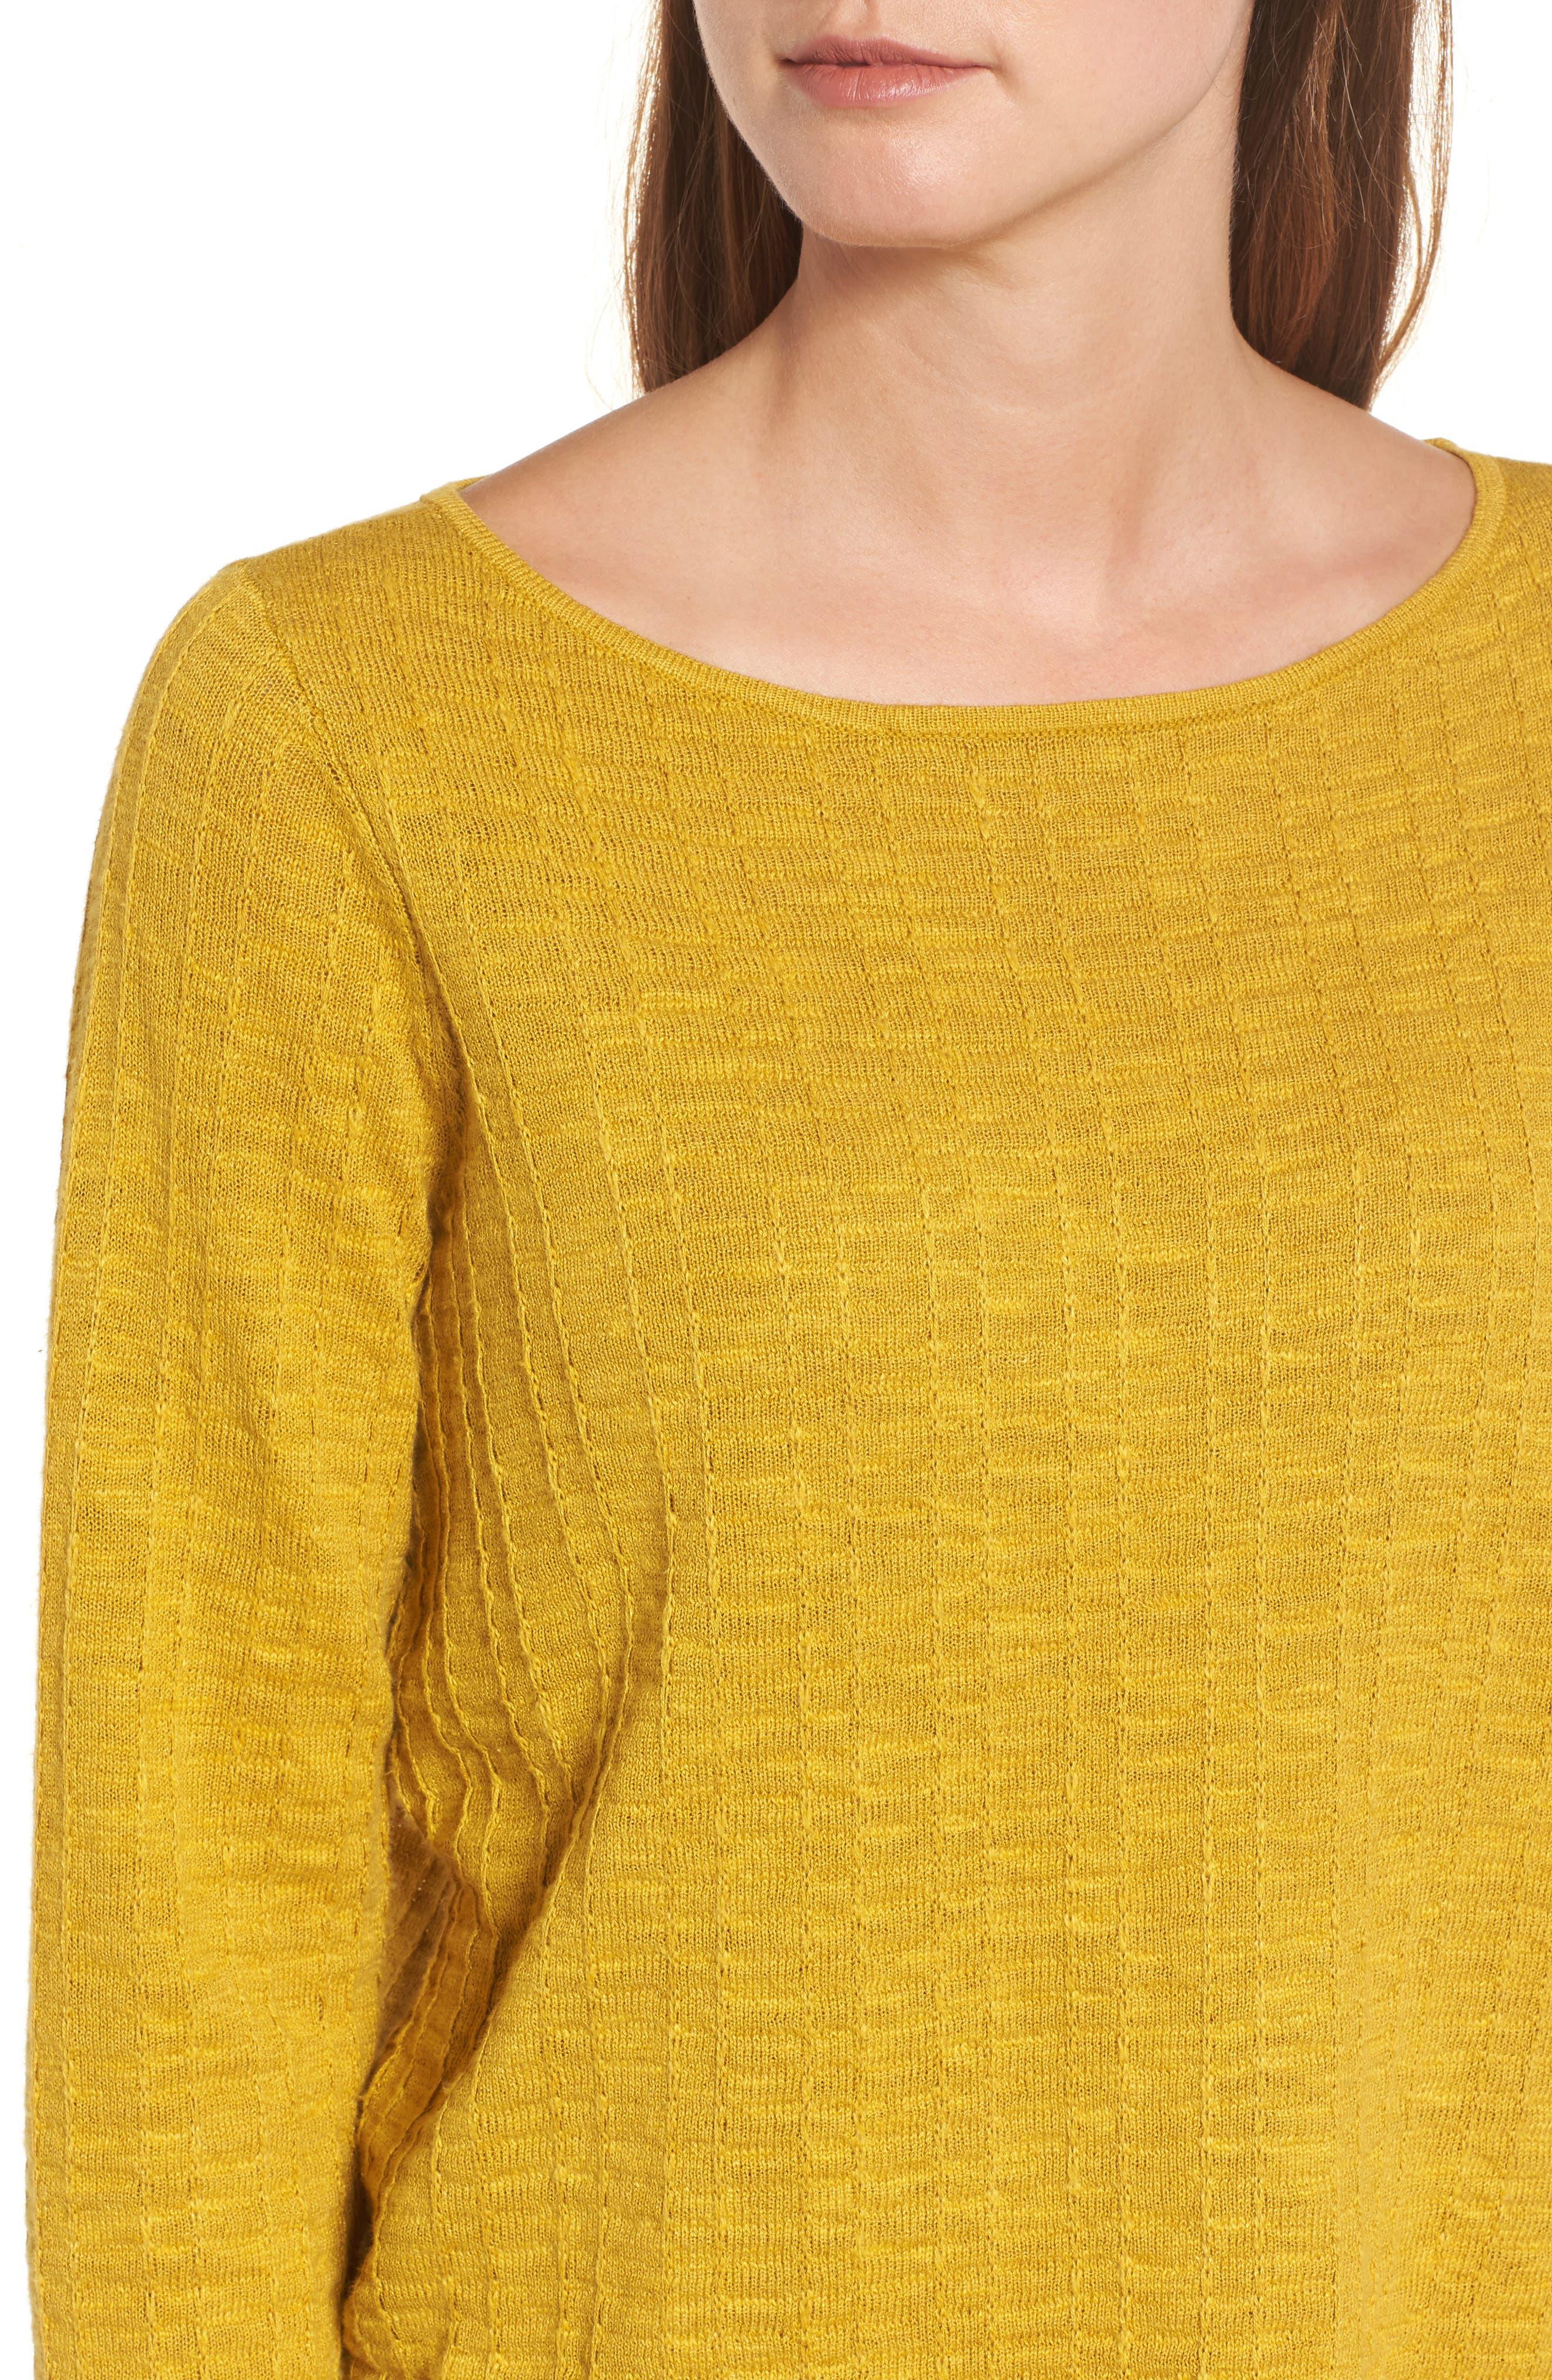 Organic Linen & Cotton Sweater,                             Alternate thumbnail 4, color,                             Mustard Seed